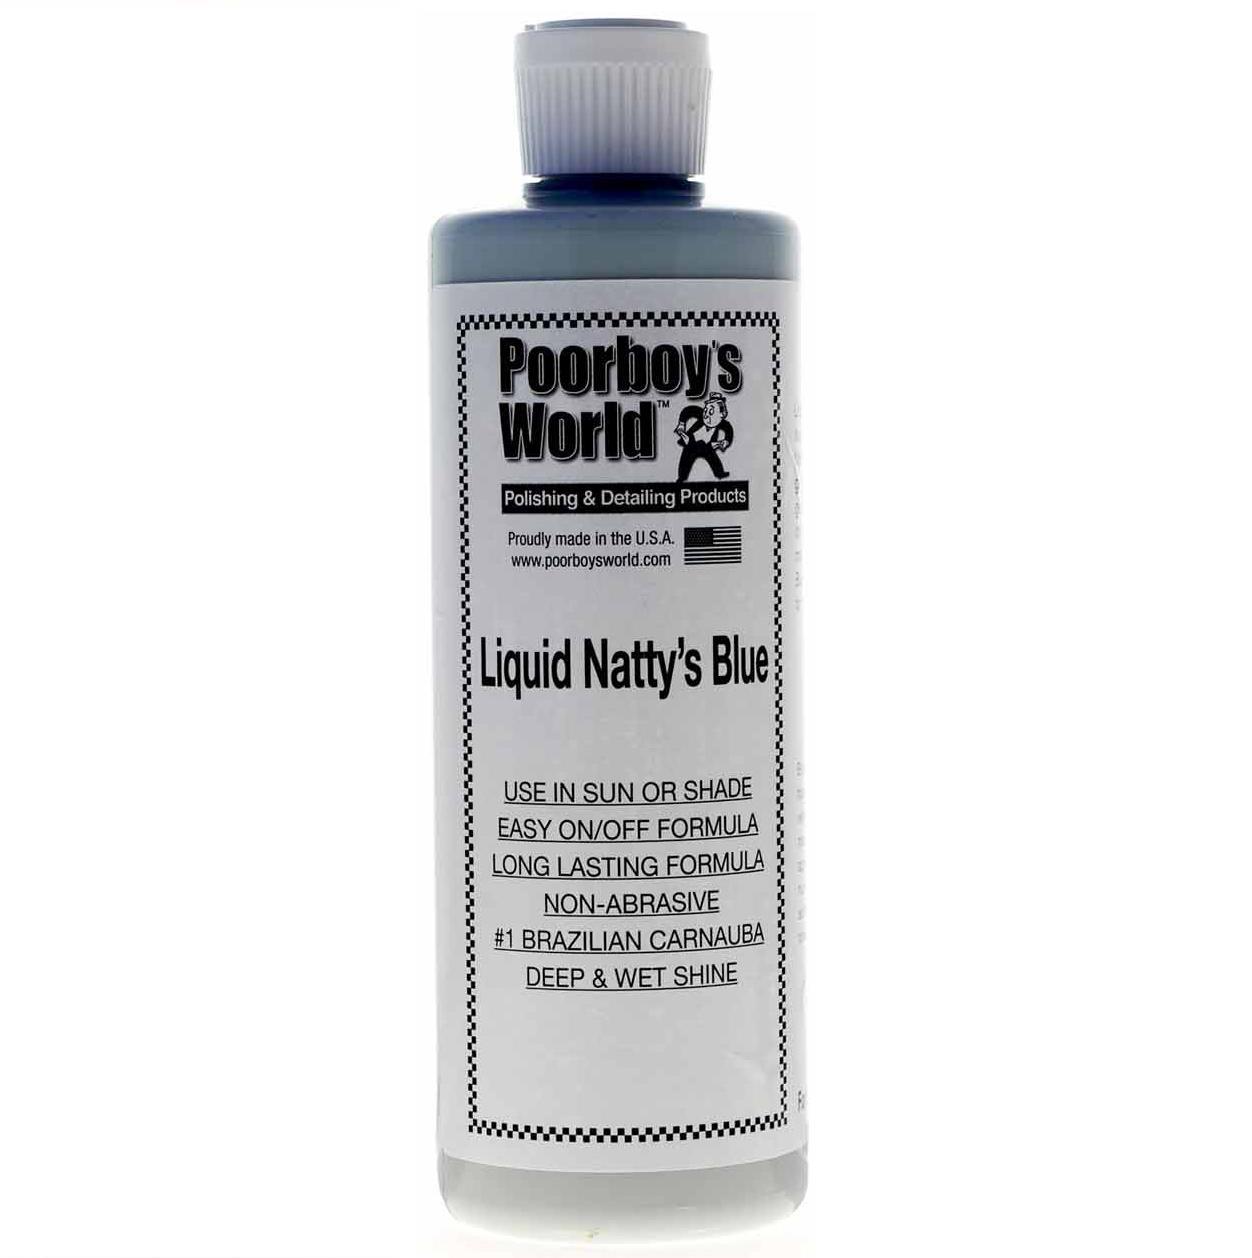 Poorboy's World Liquid Nattys Blue Wax 118ml